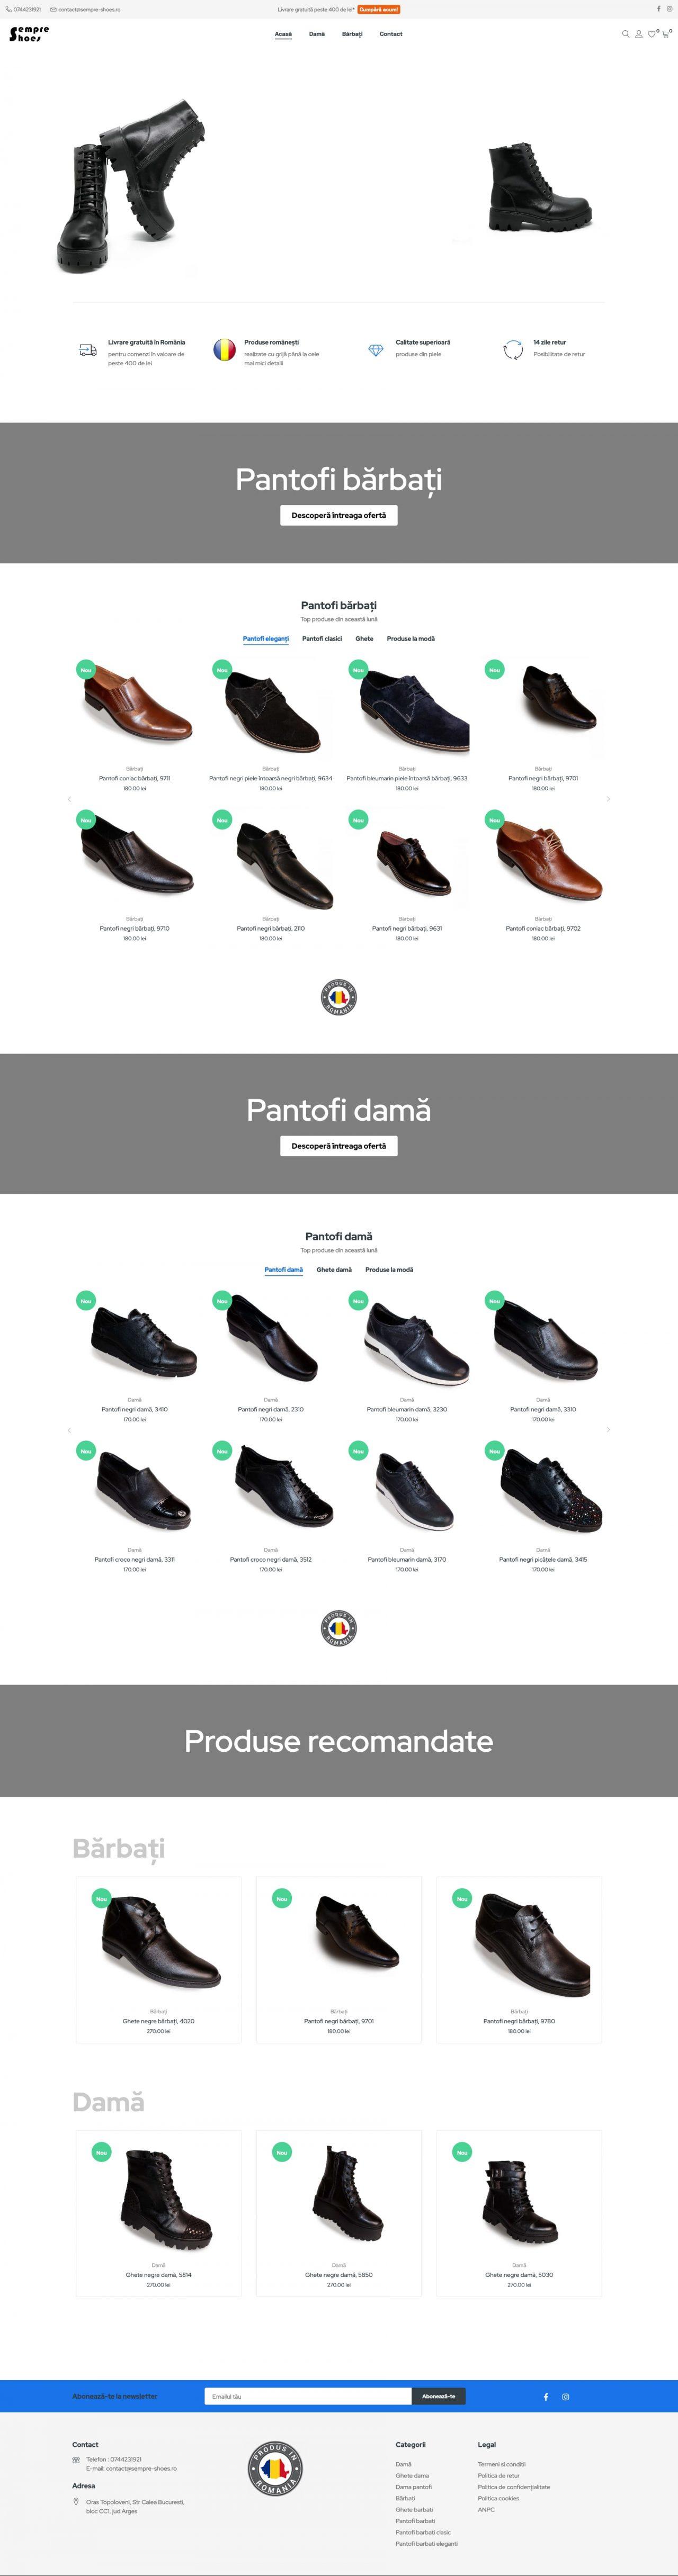 magazin online de pantofi pagina acasa